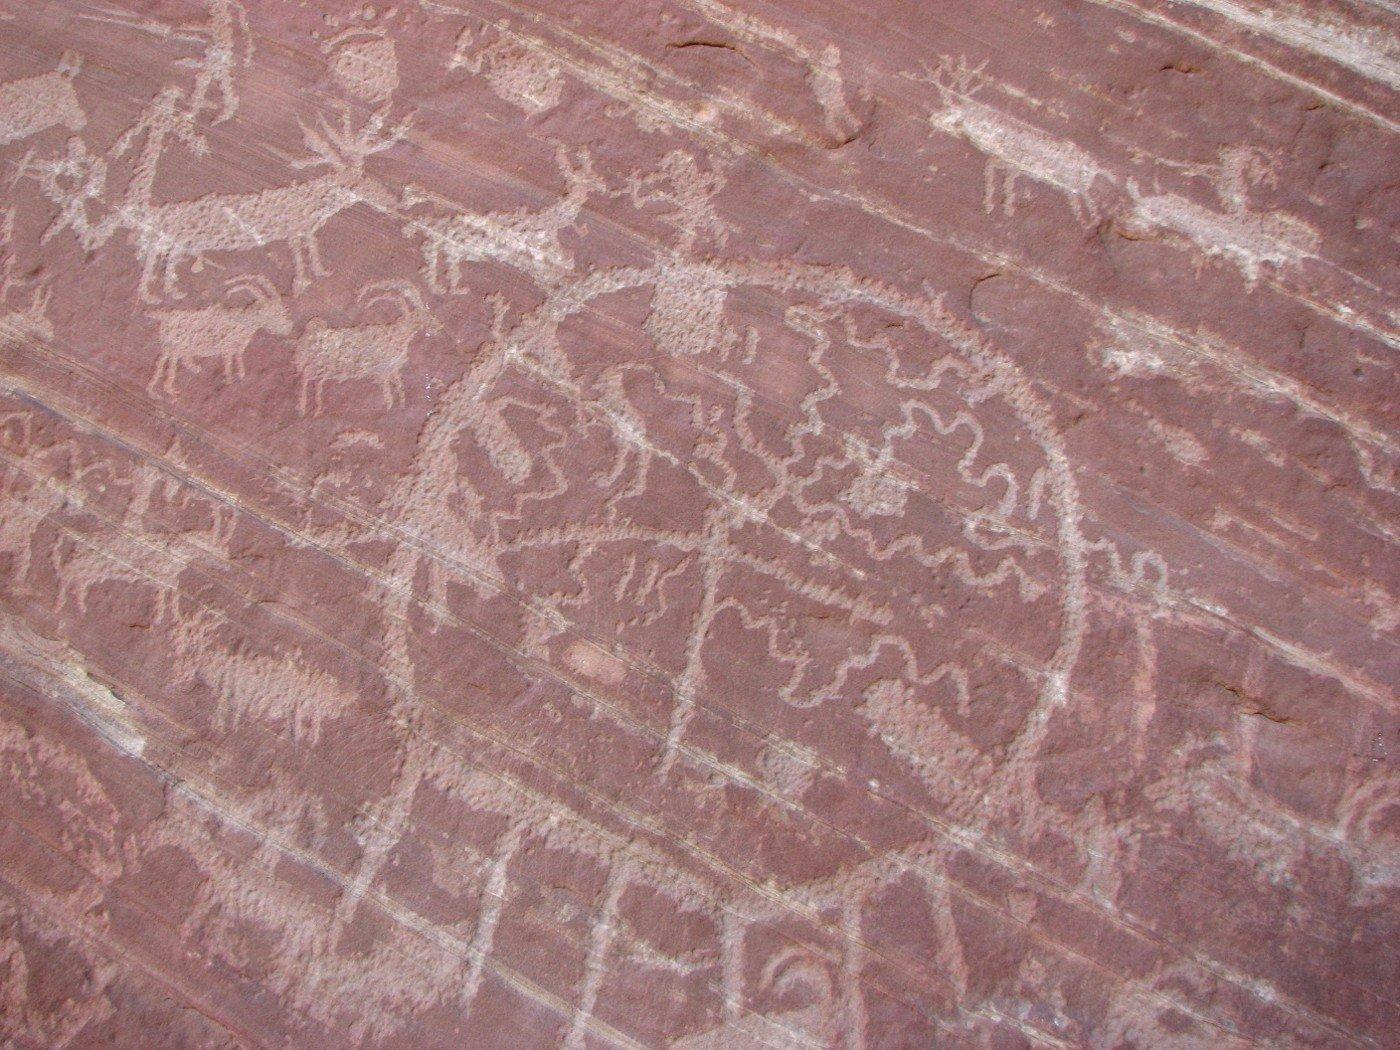 Pictographs on Walnut Knob in Comb Wash near Cedar Mesa